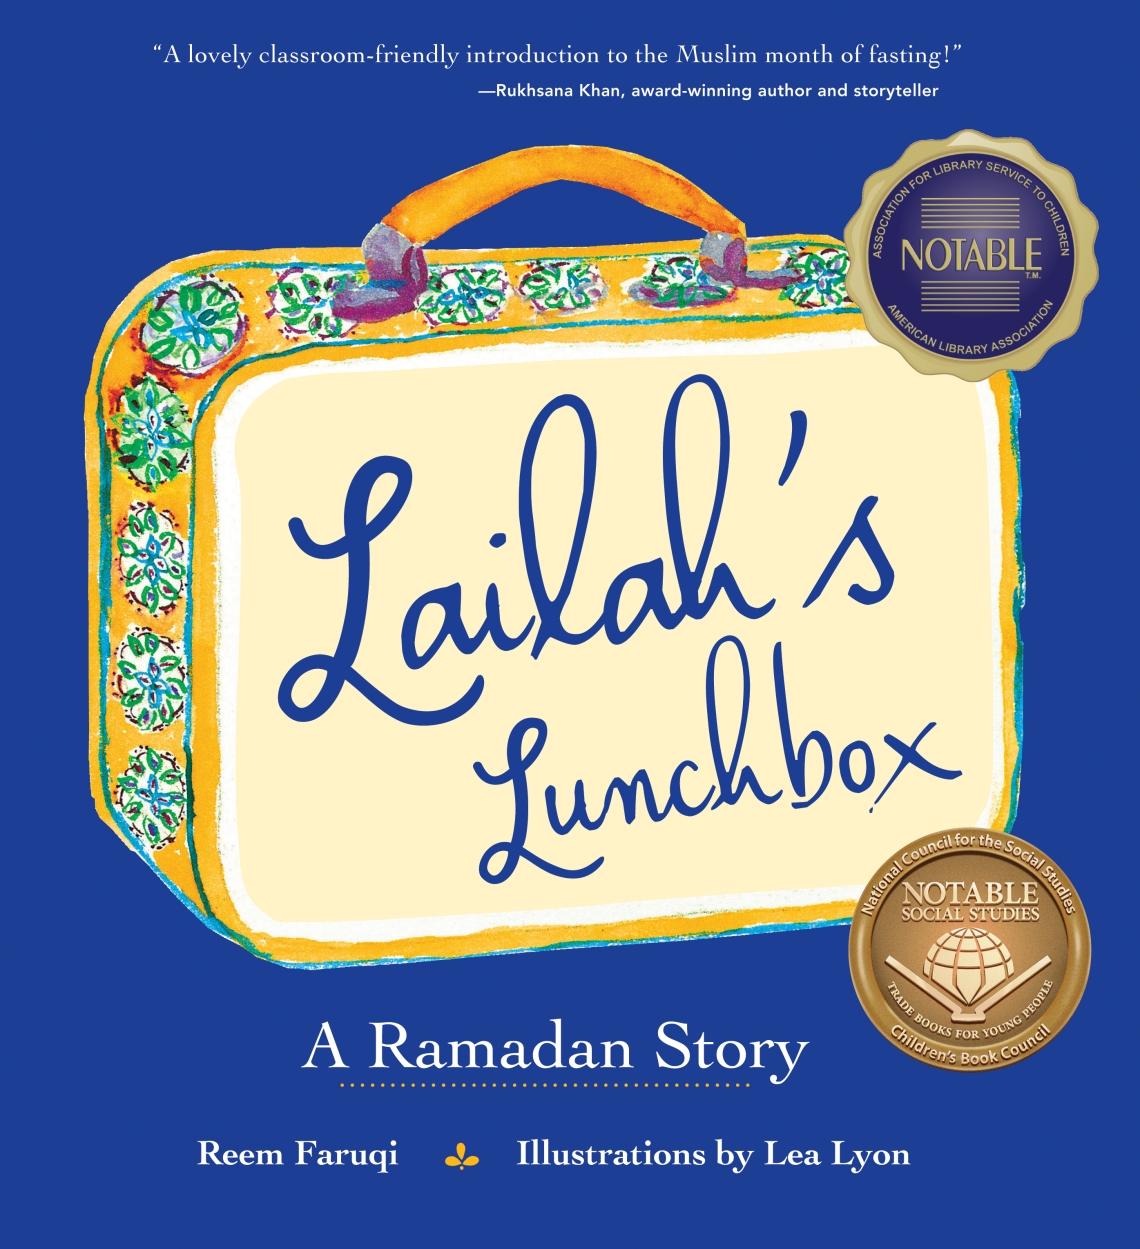 Lailah'sLunchboxCover_wMedallions[1]